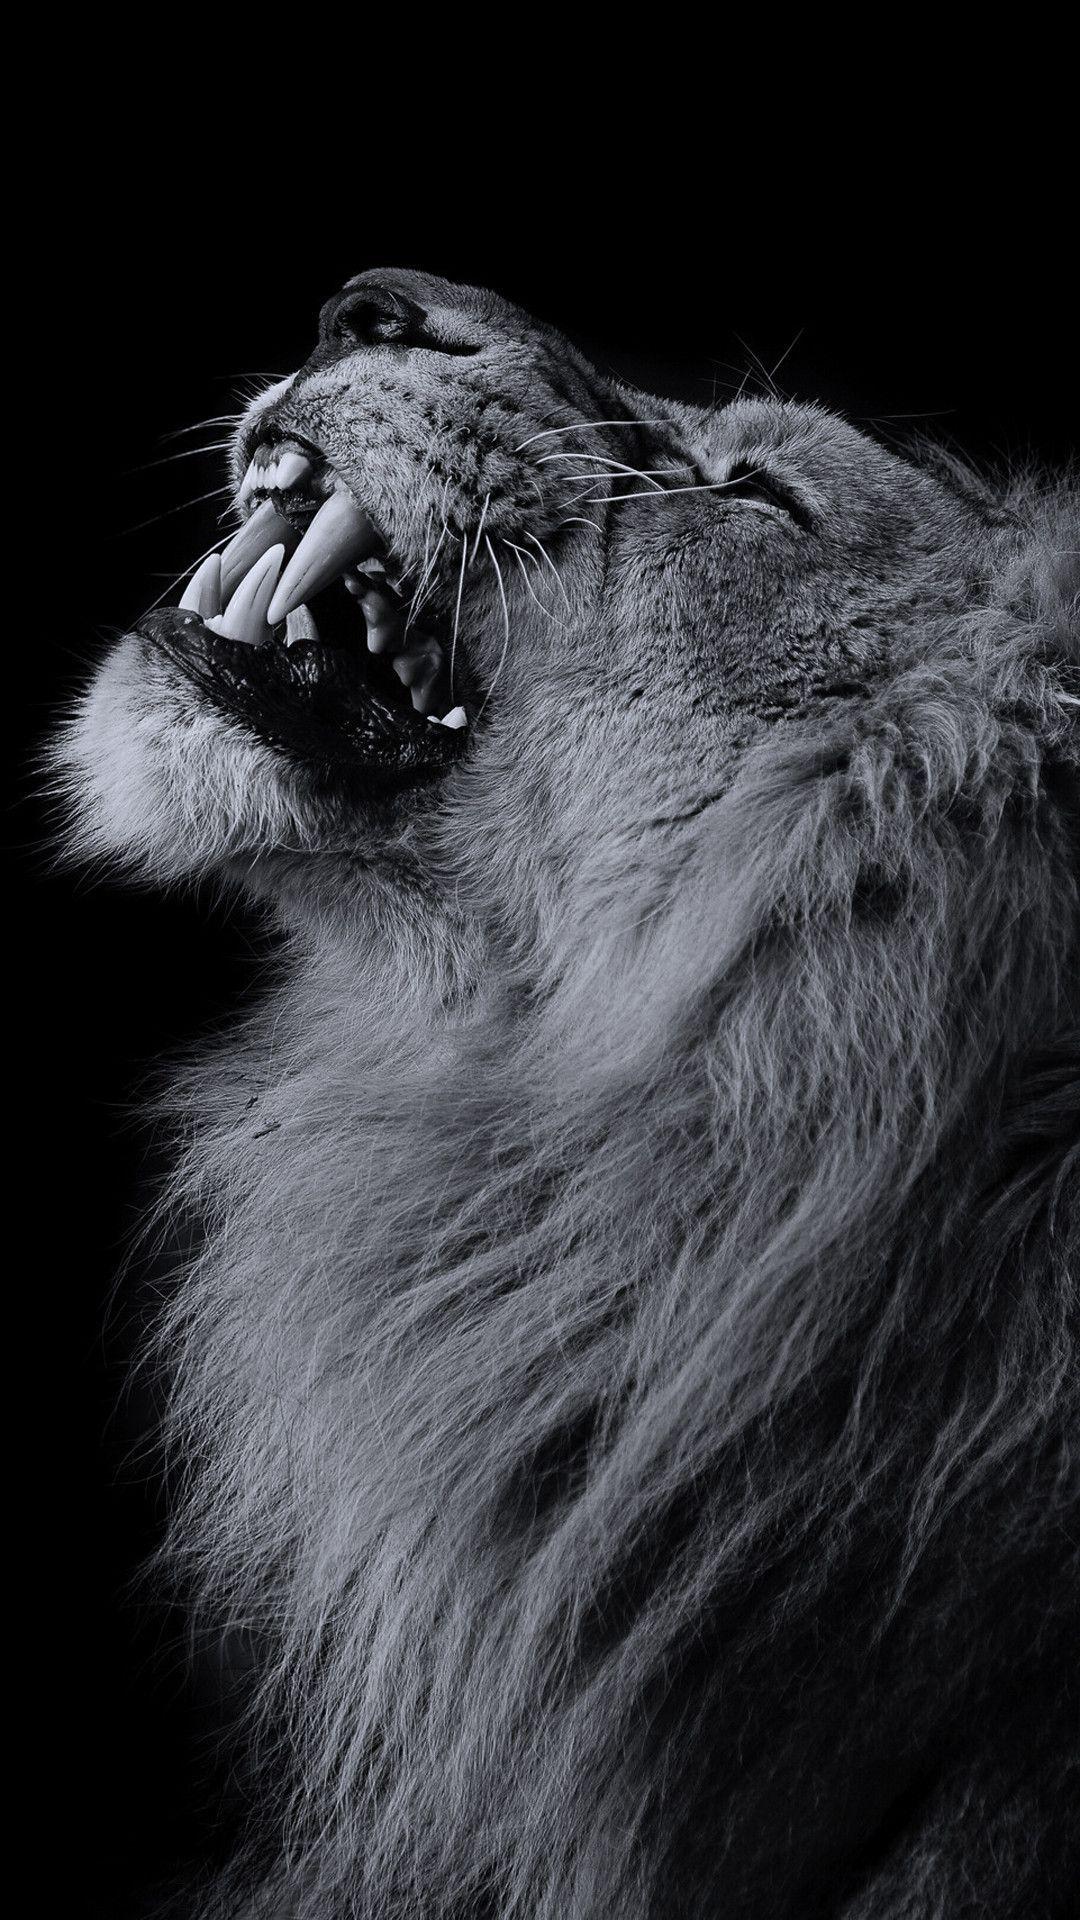 Lion Vs Bull Crocodile Vs Elephant Lion Attacks Animal Elephant Wallpaper Lion Wallpaper Iphone Black Lion Wallpaper